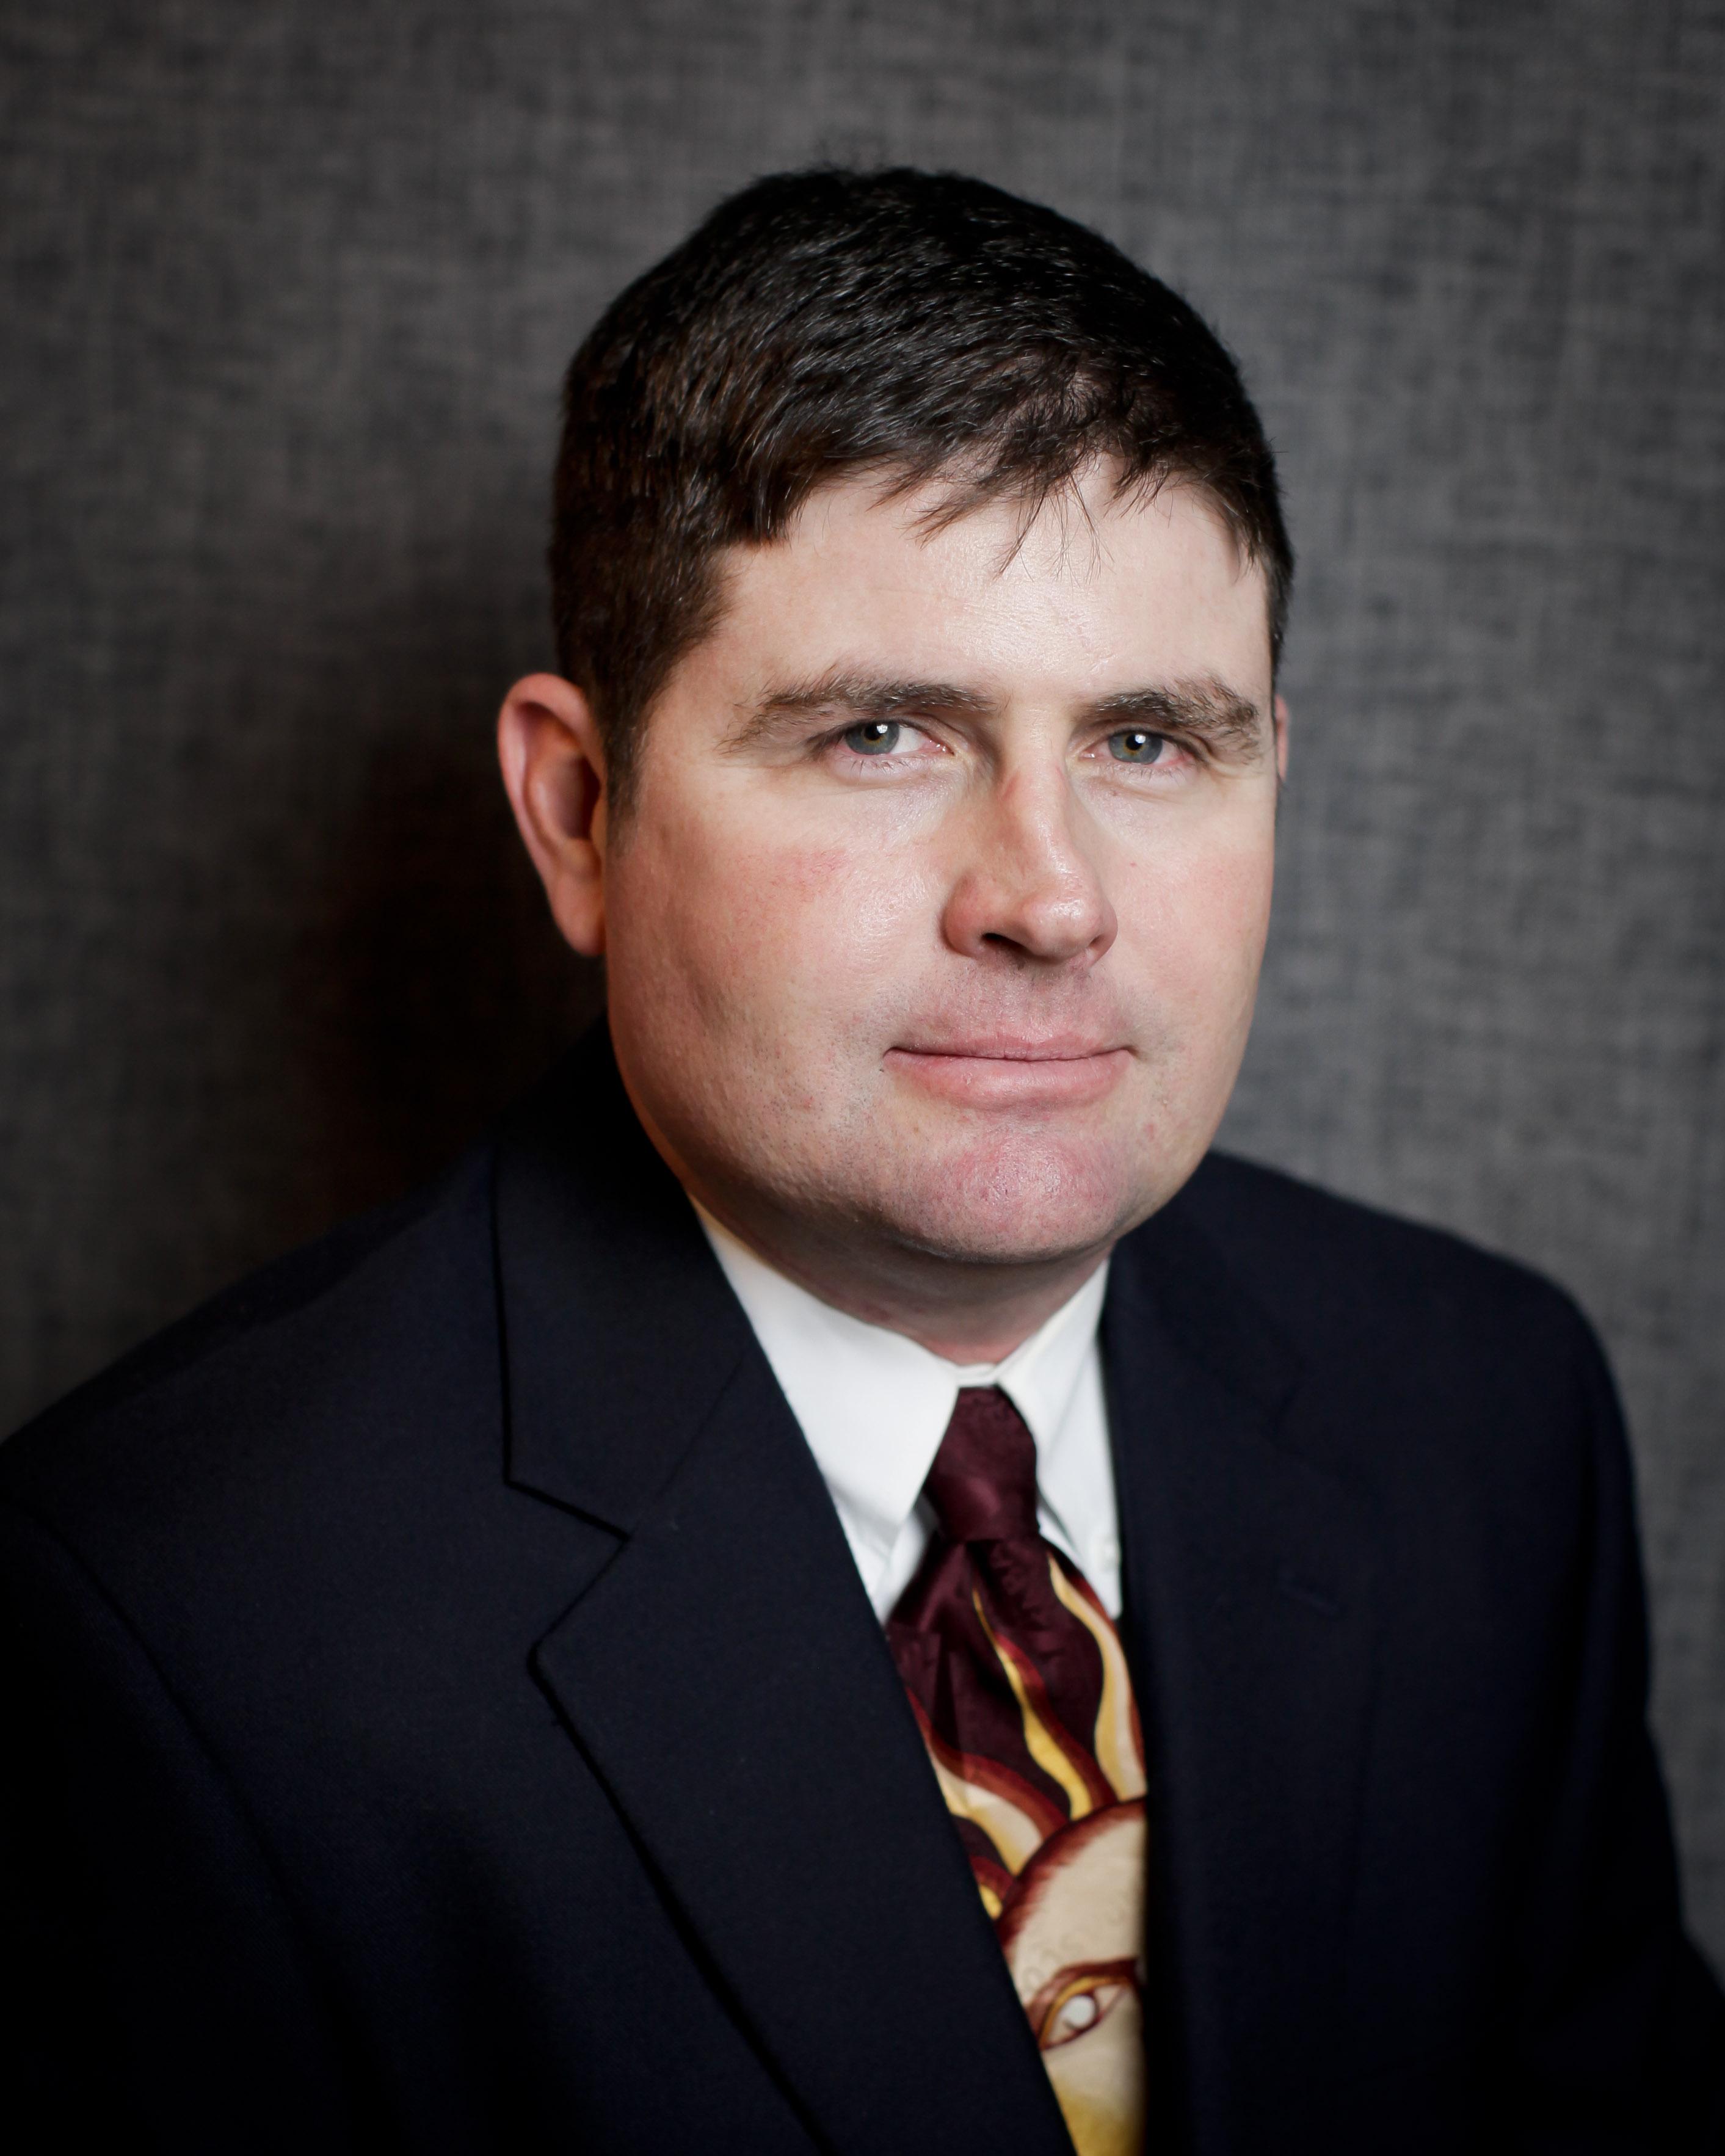 Bryan Jennings